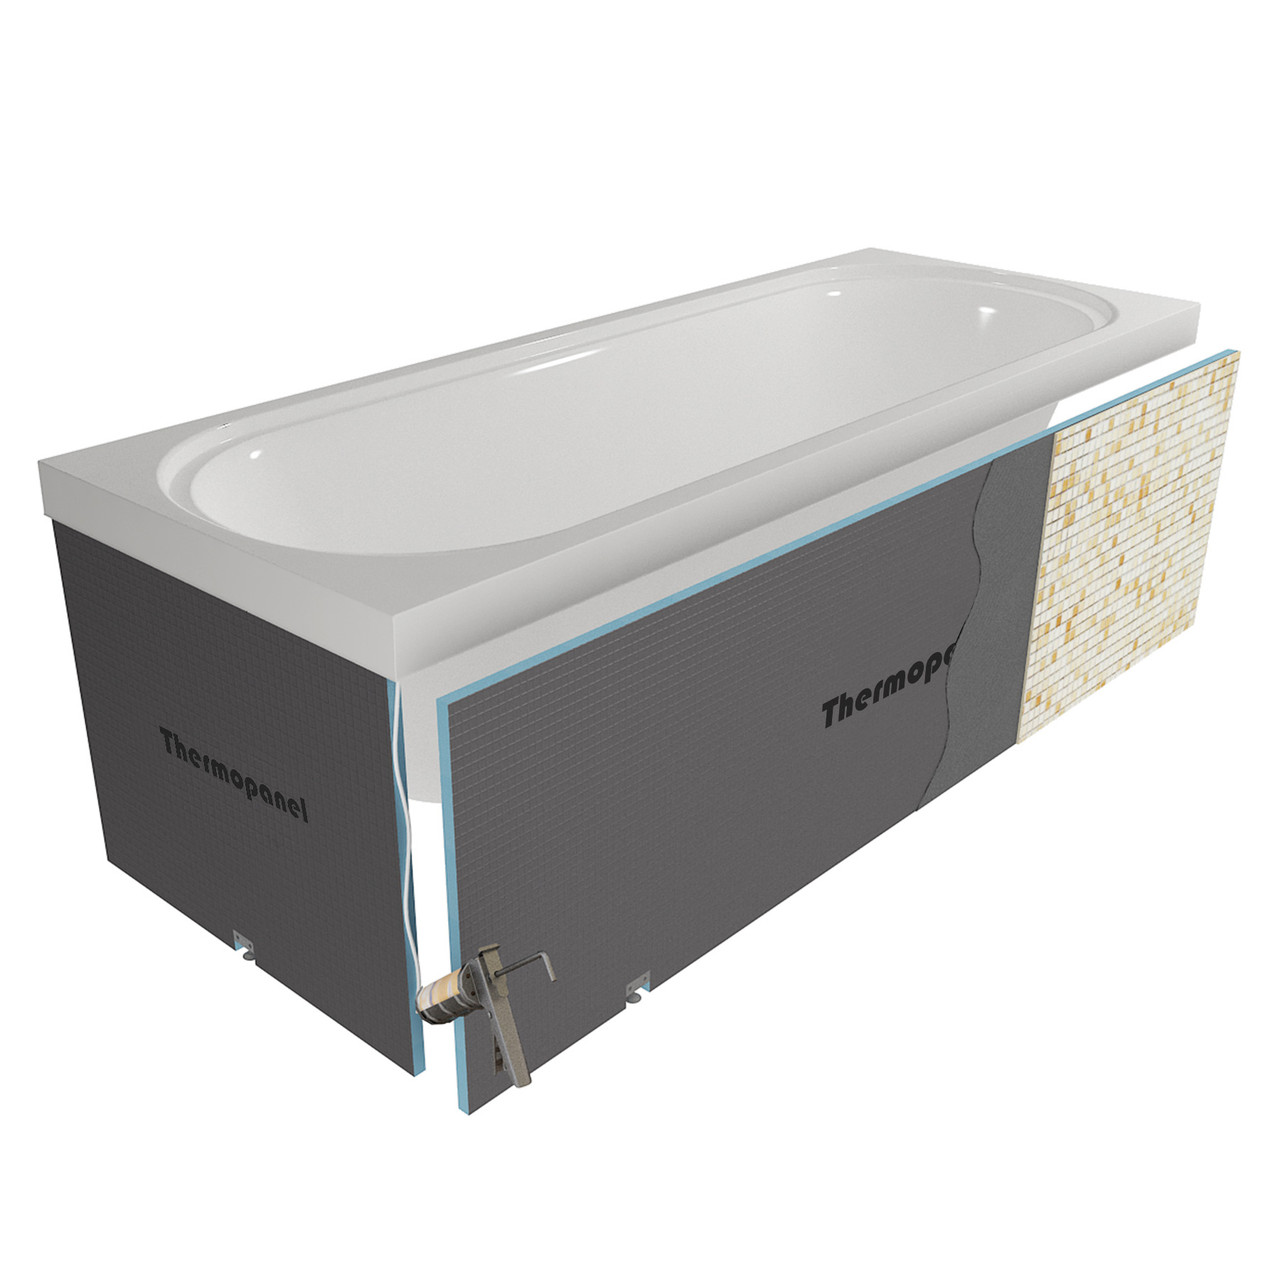 thermopanel tileable bath panels